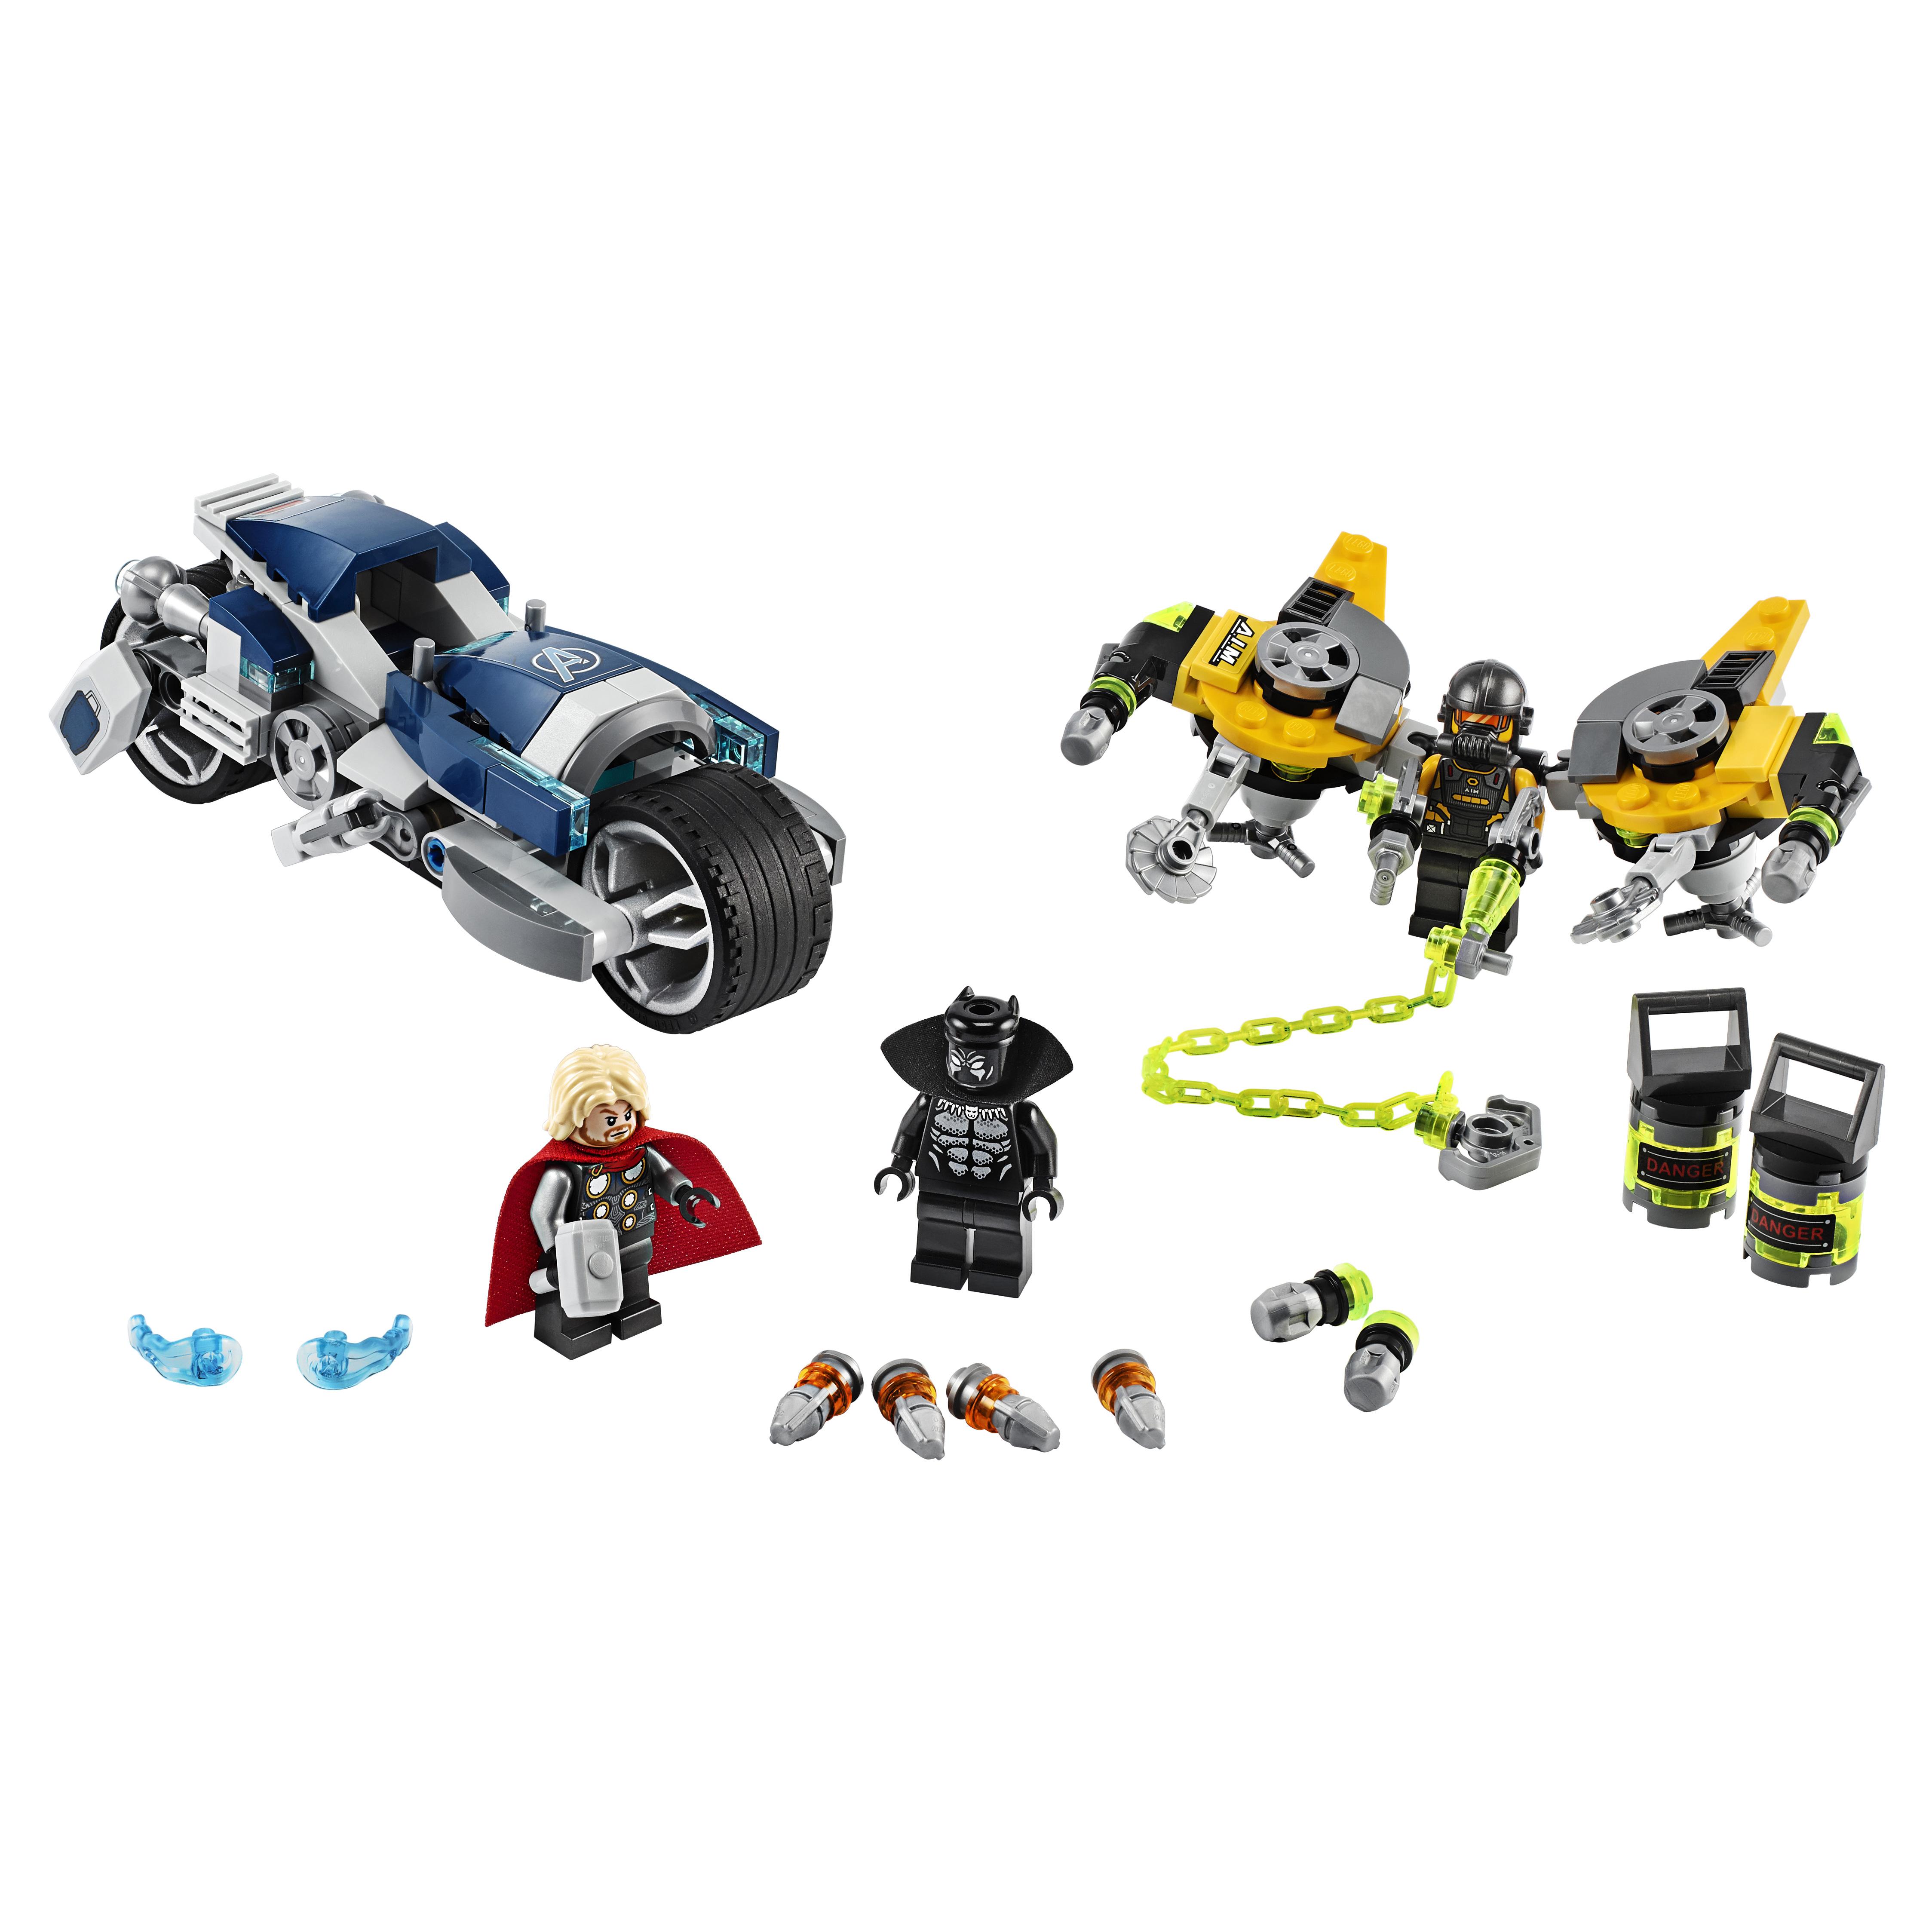 Купить Конструктор LEGO Marvel Avengers Movie 4 76142 Мстители: Атака на спортбайке, LEGO Super Heroes